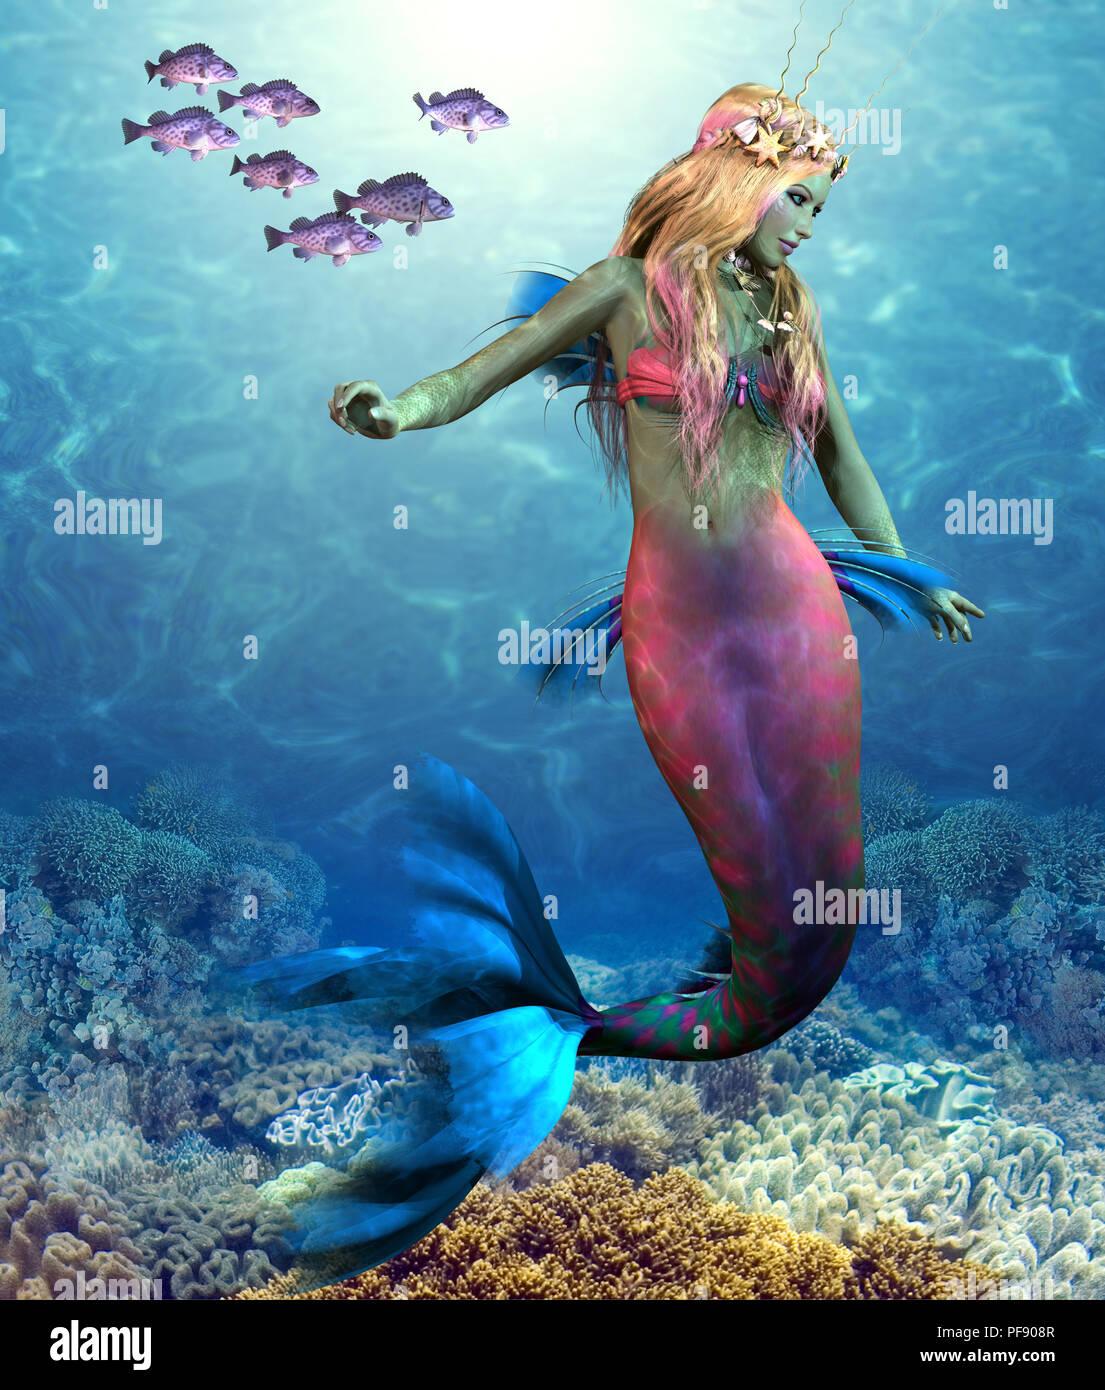 Coral Reef Mermaid - A school of Blue Rockfish swim along side of a beautiful mermaid as she glides along an ocean reef. - Stock Image